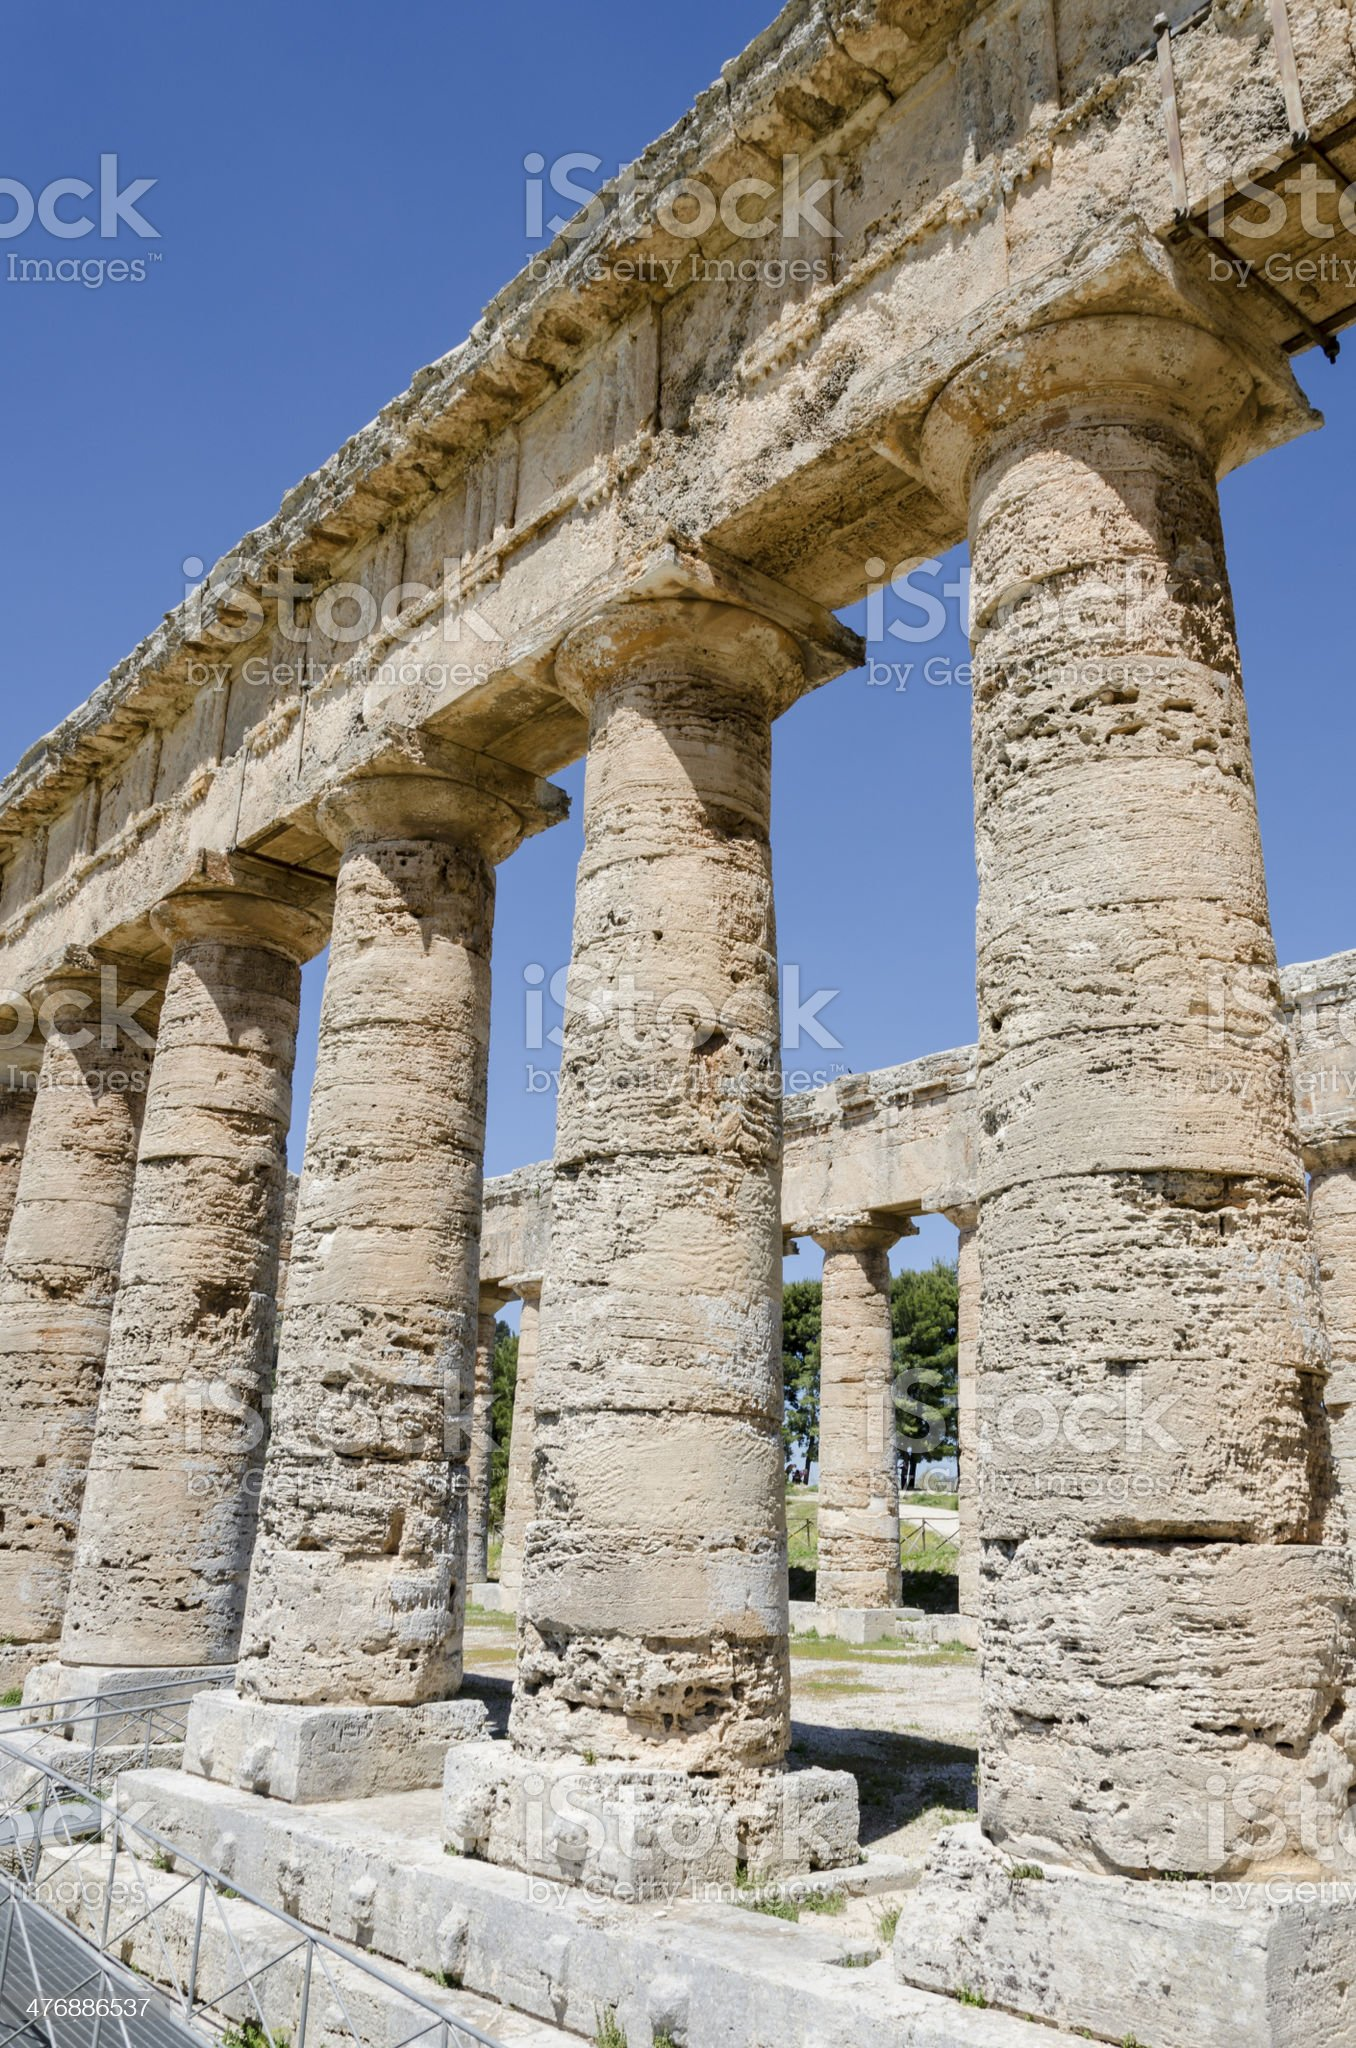 Doric Temple in Segesta, Sicily, Italy royalty-free stock photo